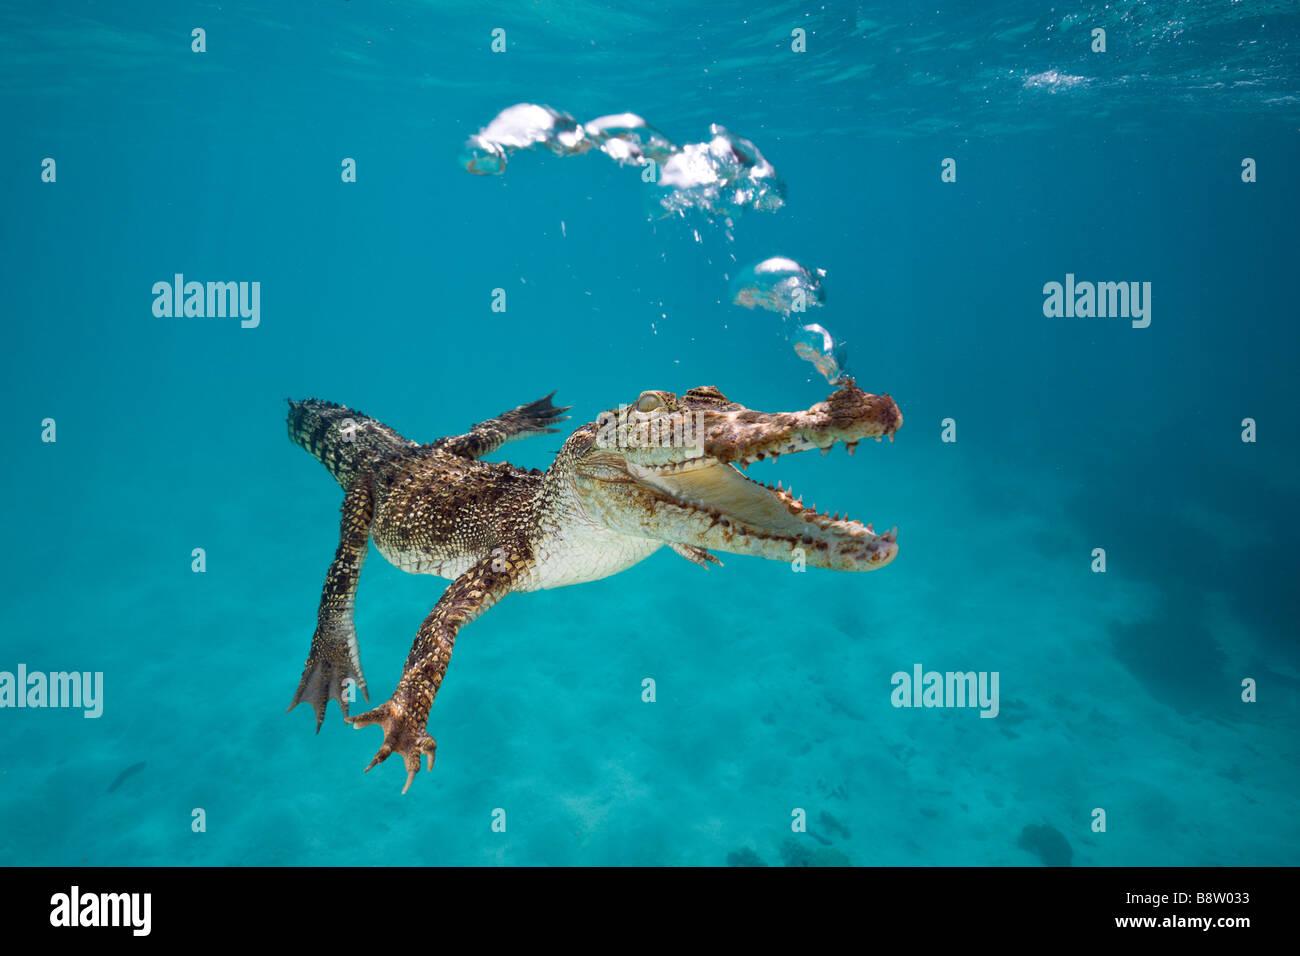 Saltwater Crocodile Crocodylus porosus Queensland Australia - Stock Image